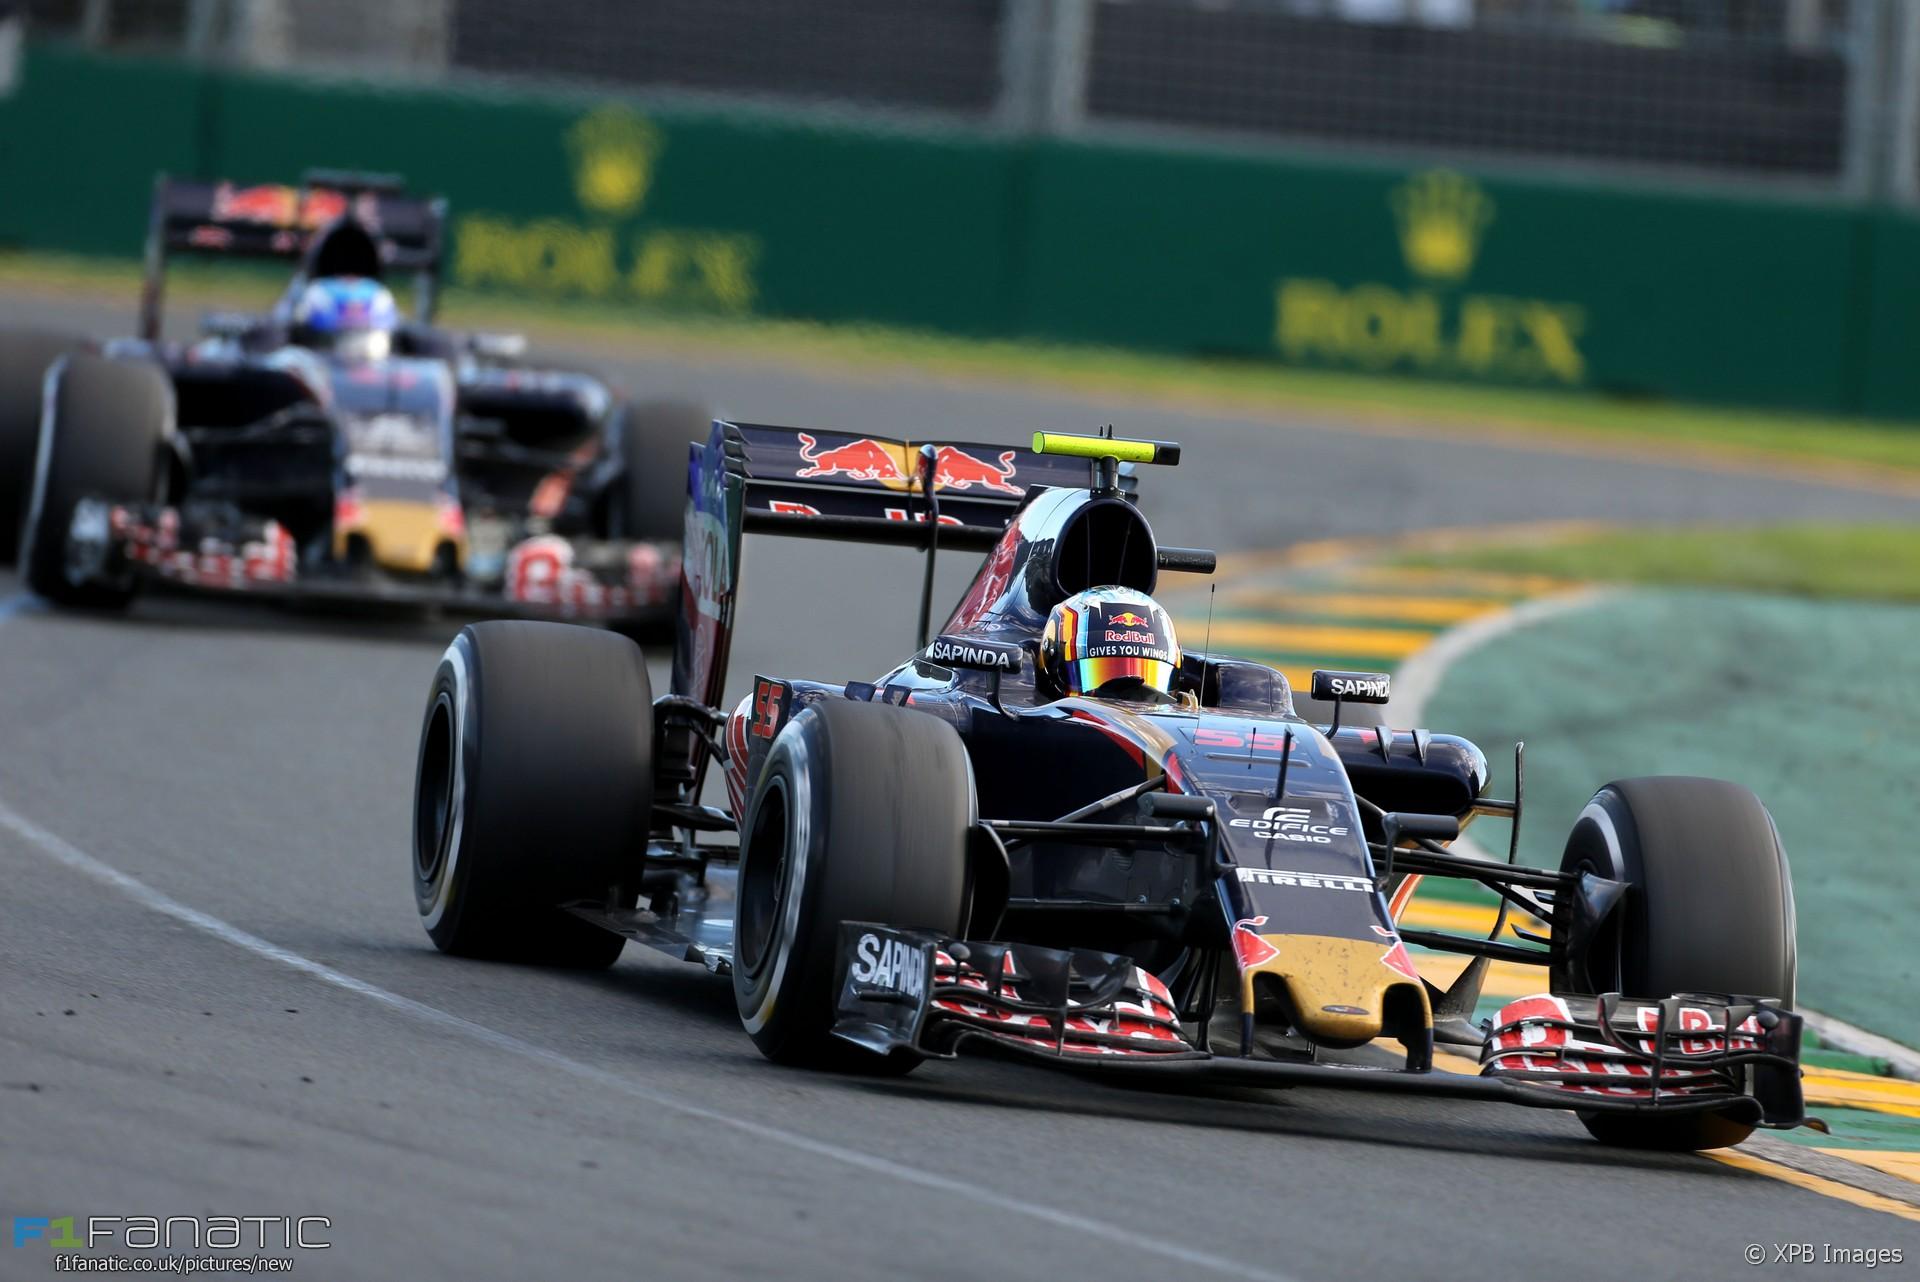 Carlos Sainz Jnr, Toro Rosso, Albert Park, 2016